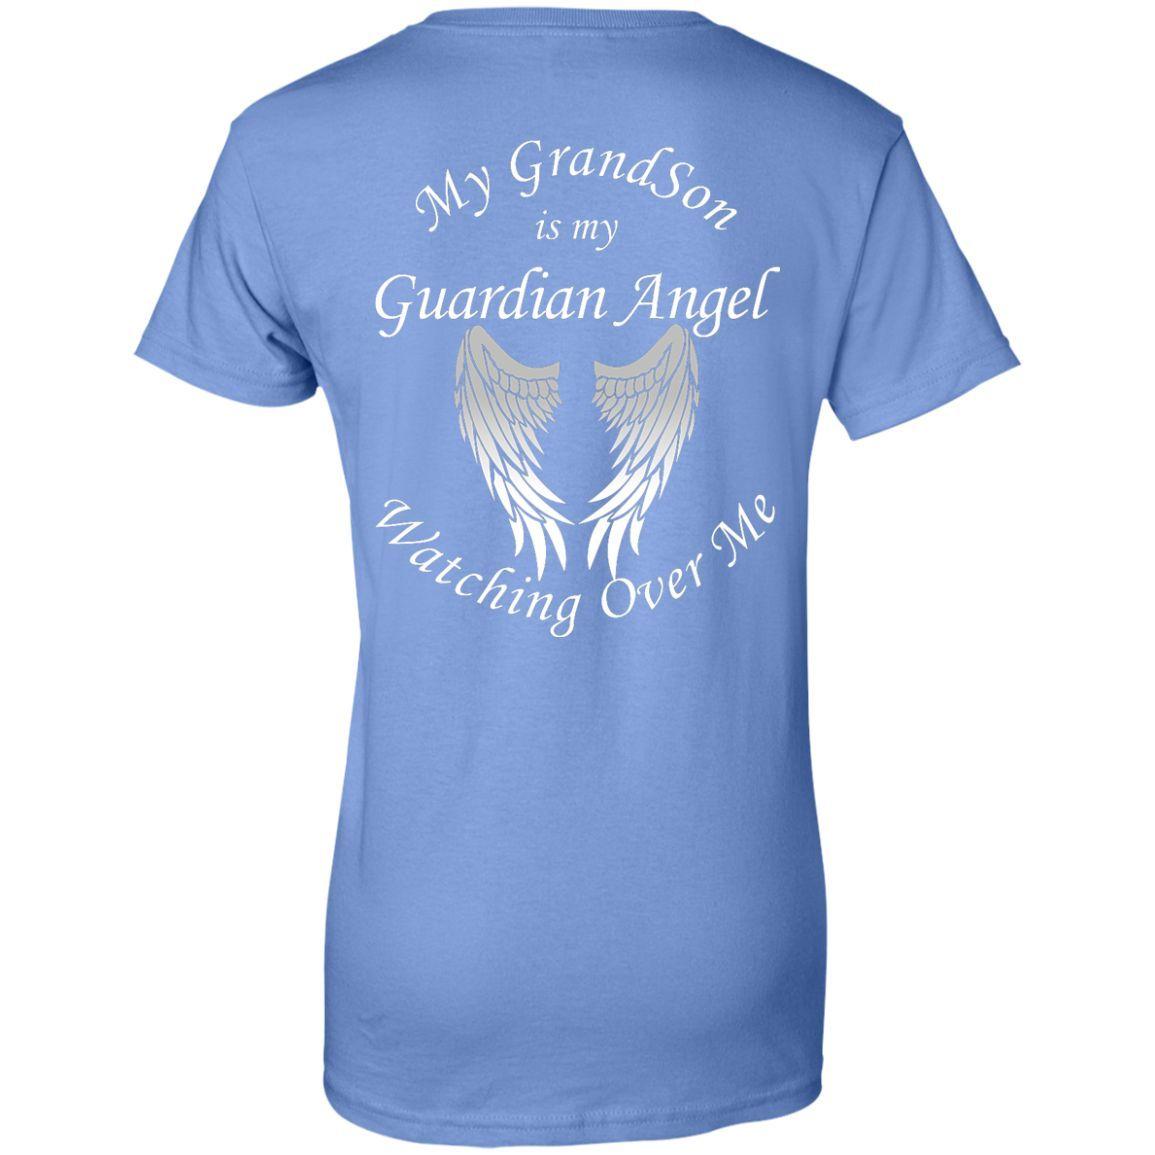 GrandSon Guardian Angel Lady T Shirt